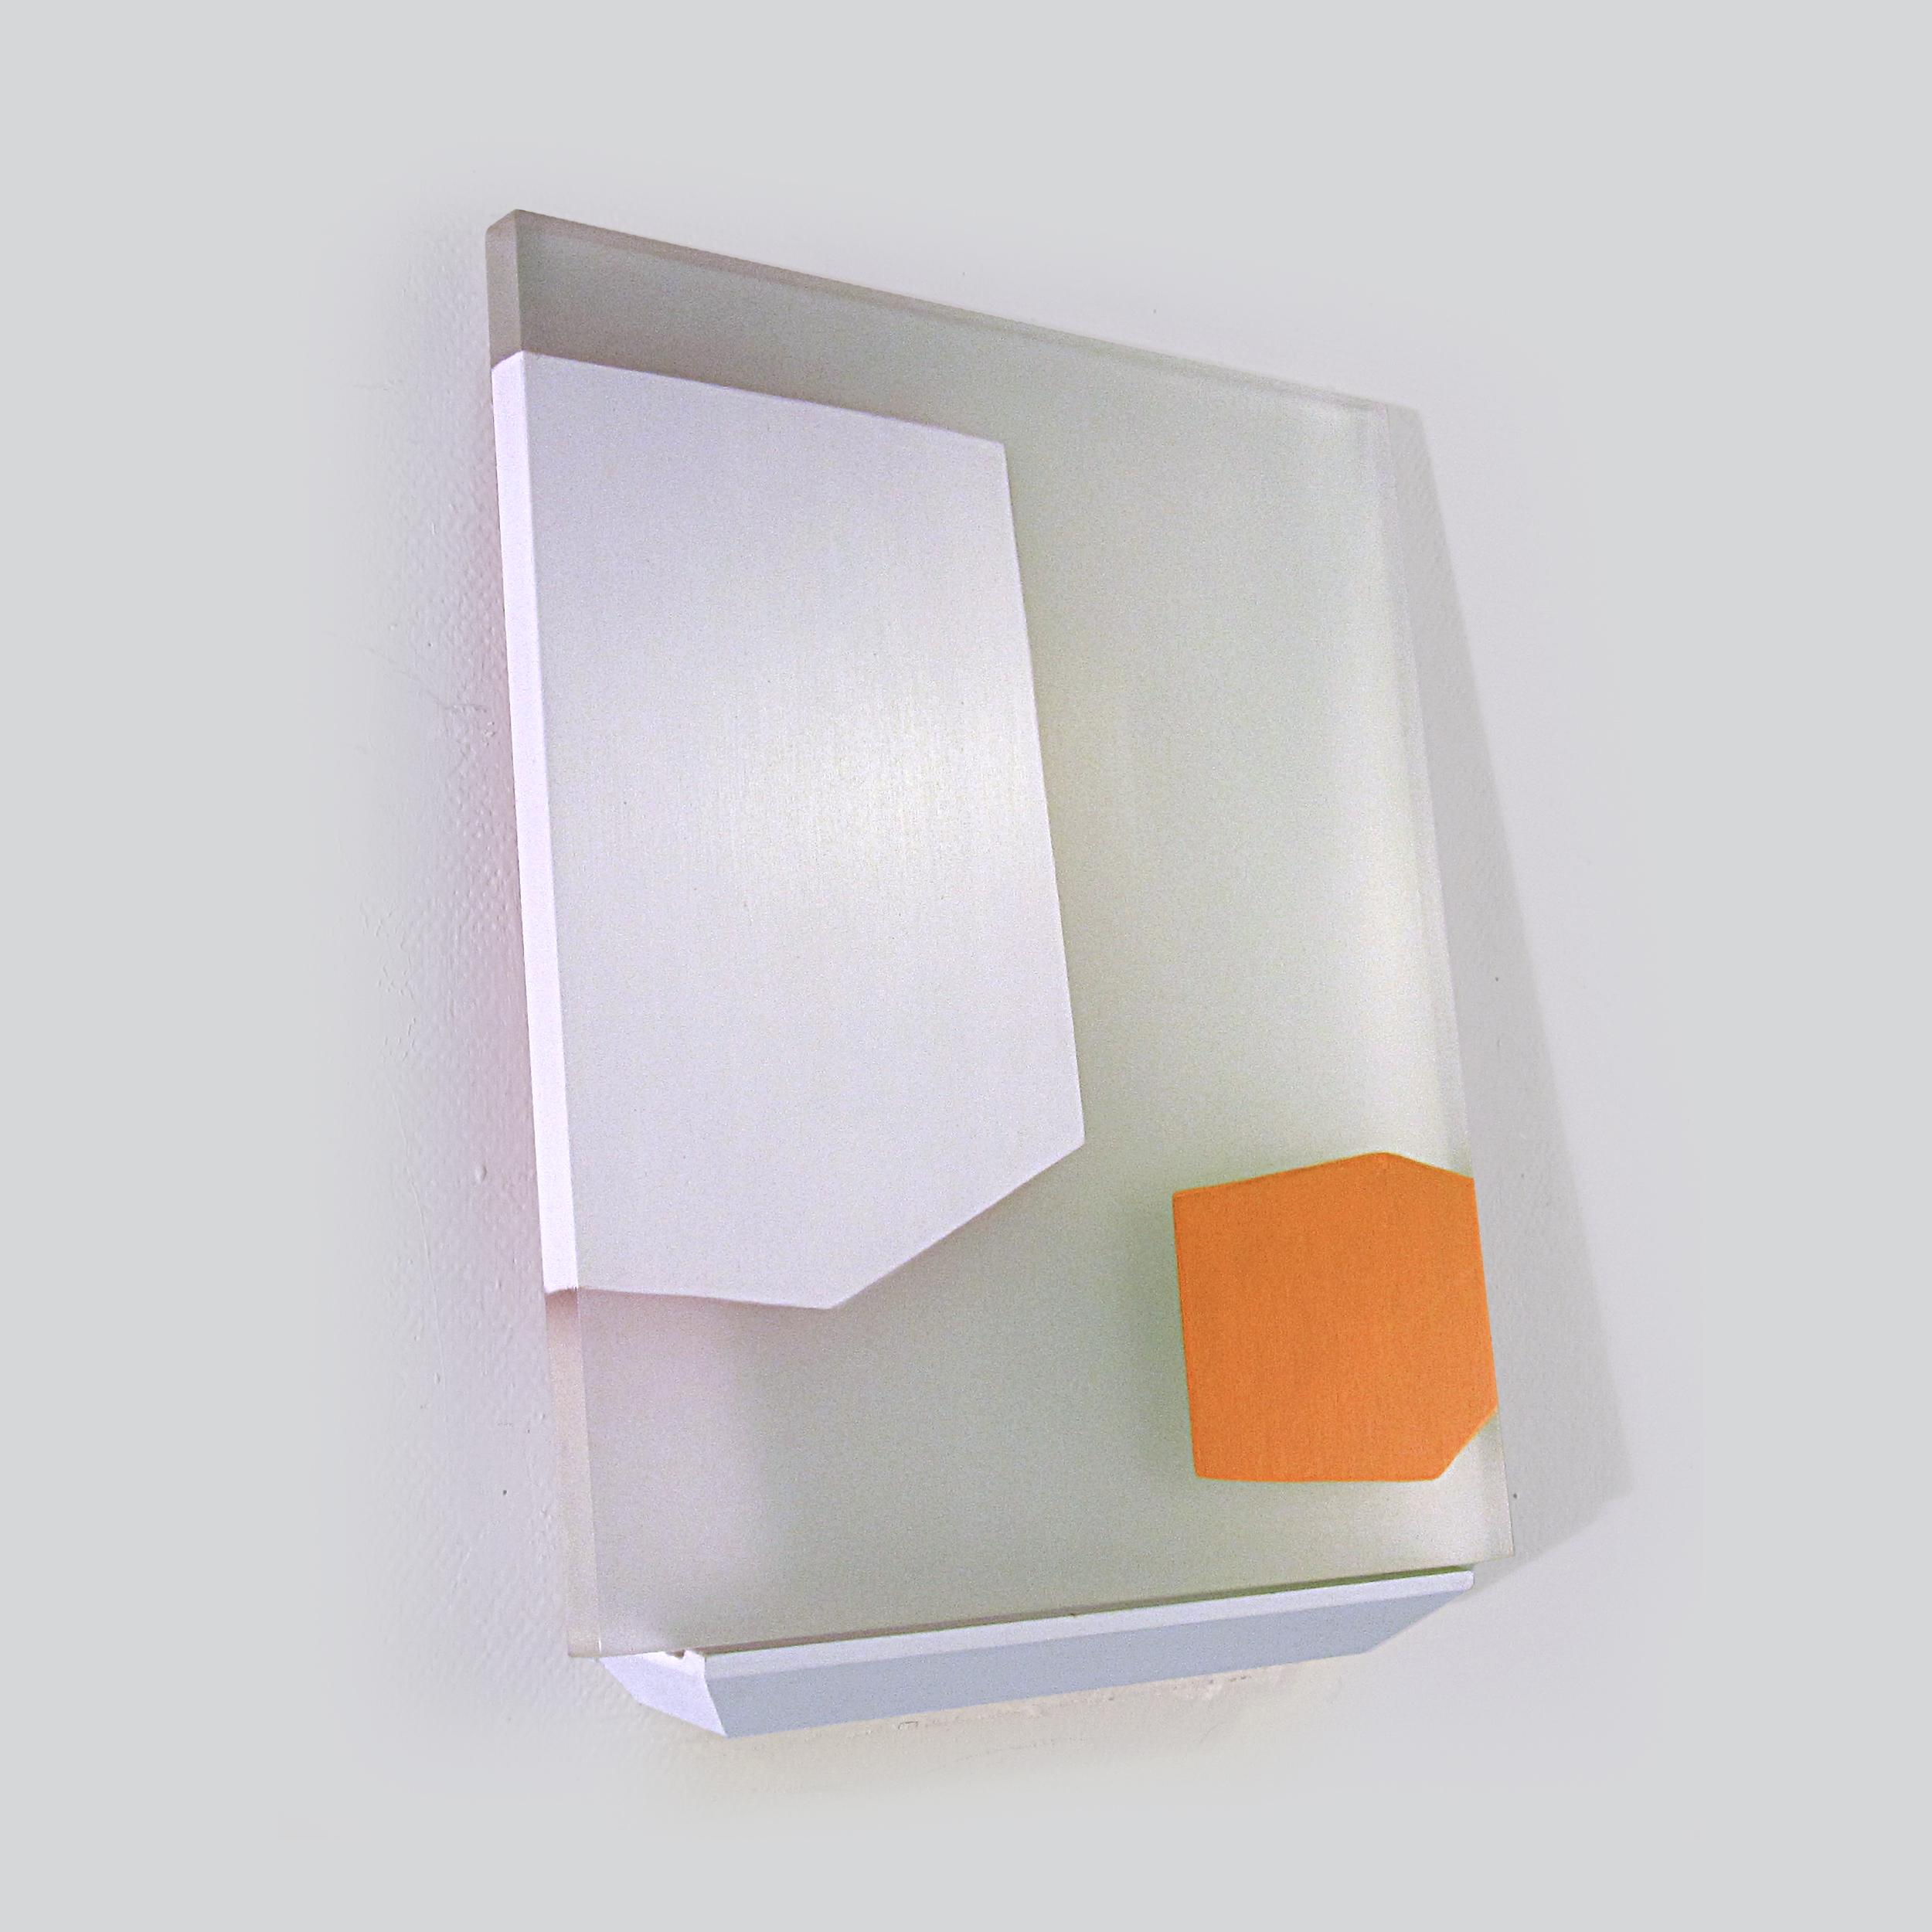 Ruse of Transparency 14     2010     acrylic on plexiglass, shelf     17 x 14 inches